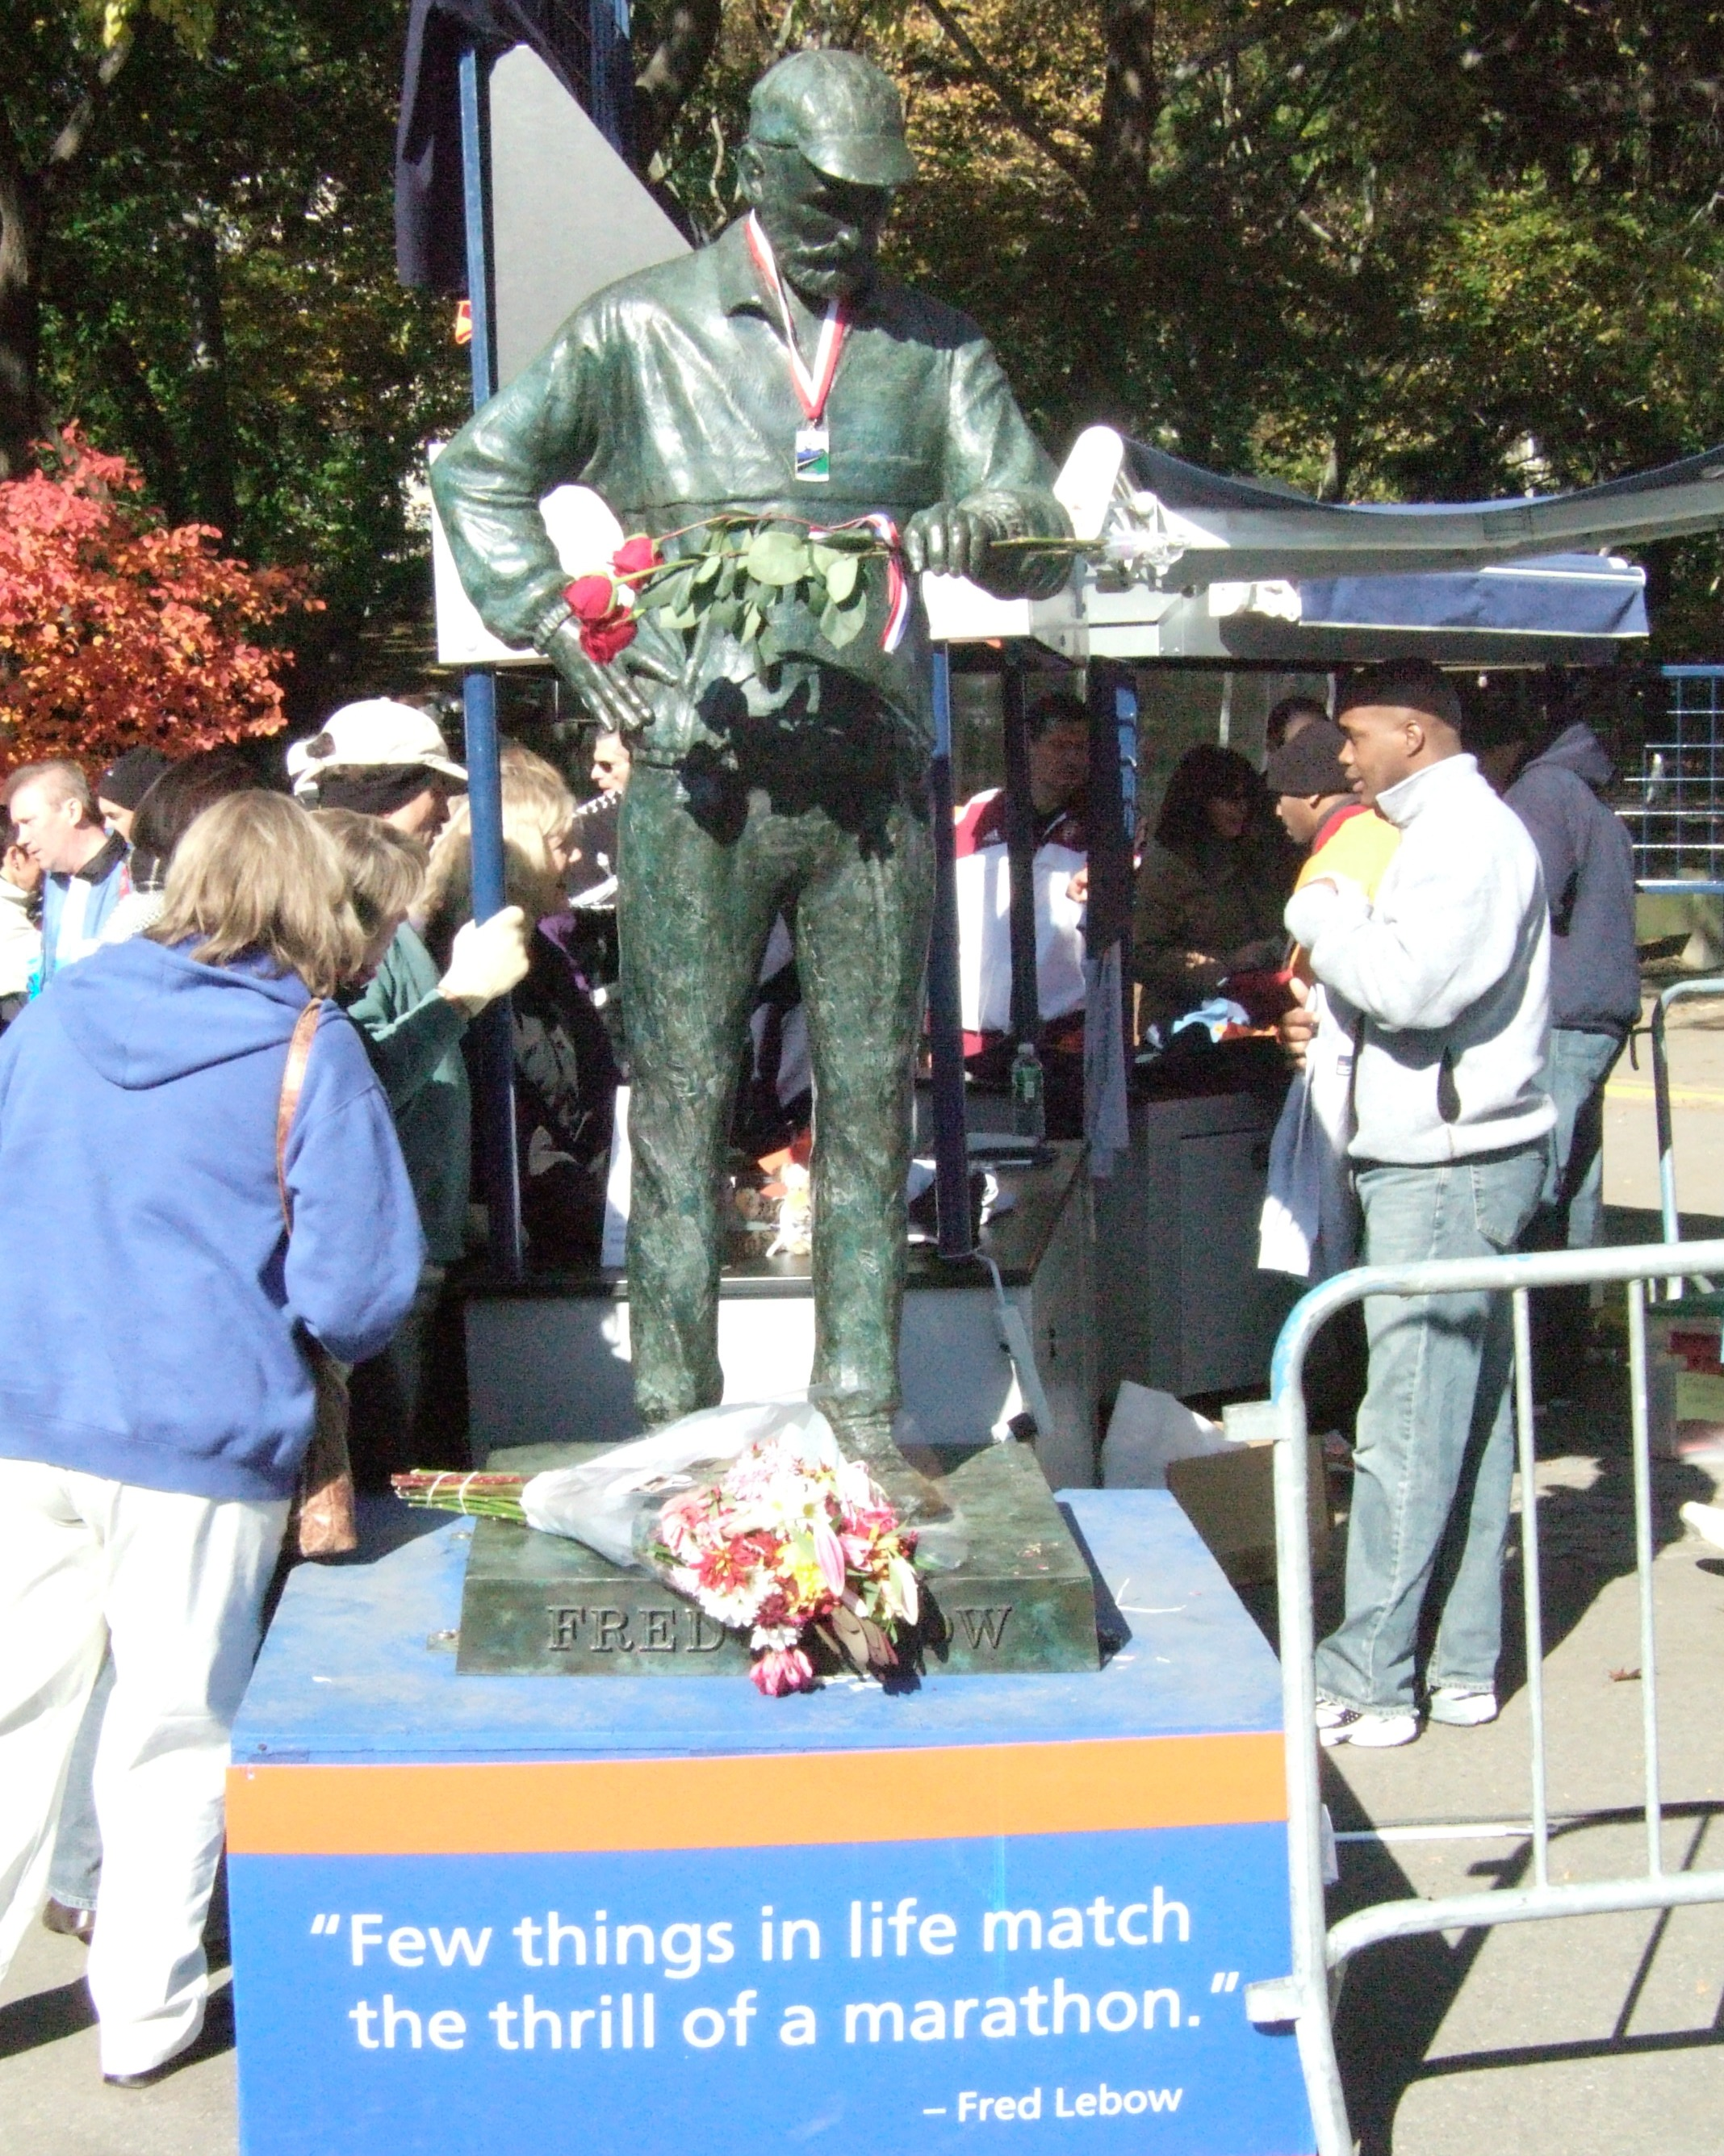 Fred Lebow Sculpture, NYC Marathon